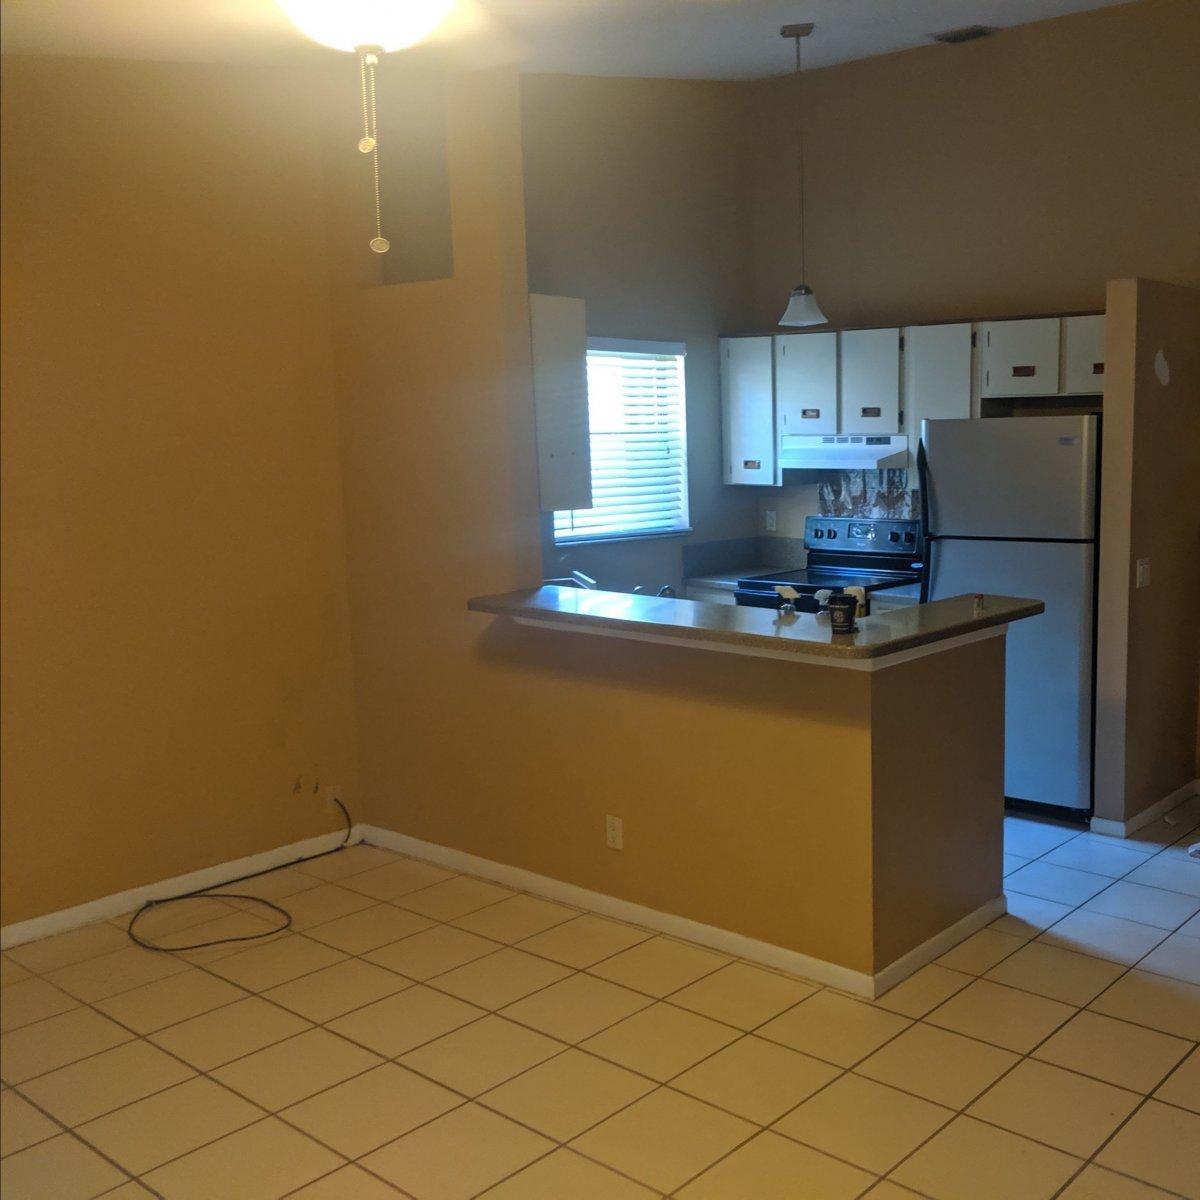 3684 NW 83rd Ln Sunrise, FL 33351, USA